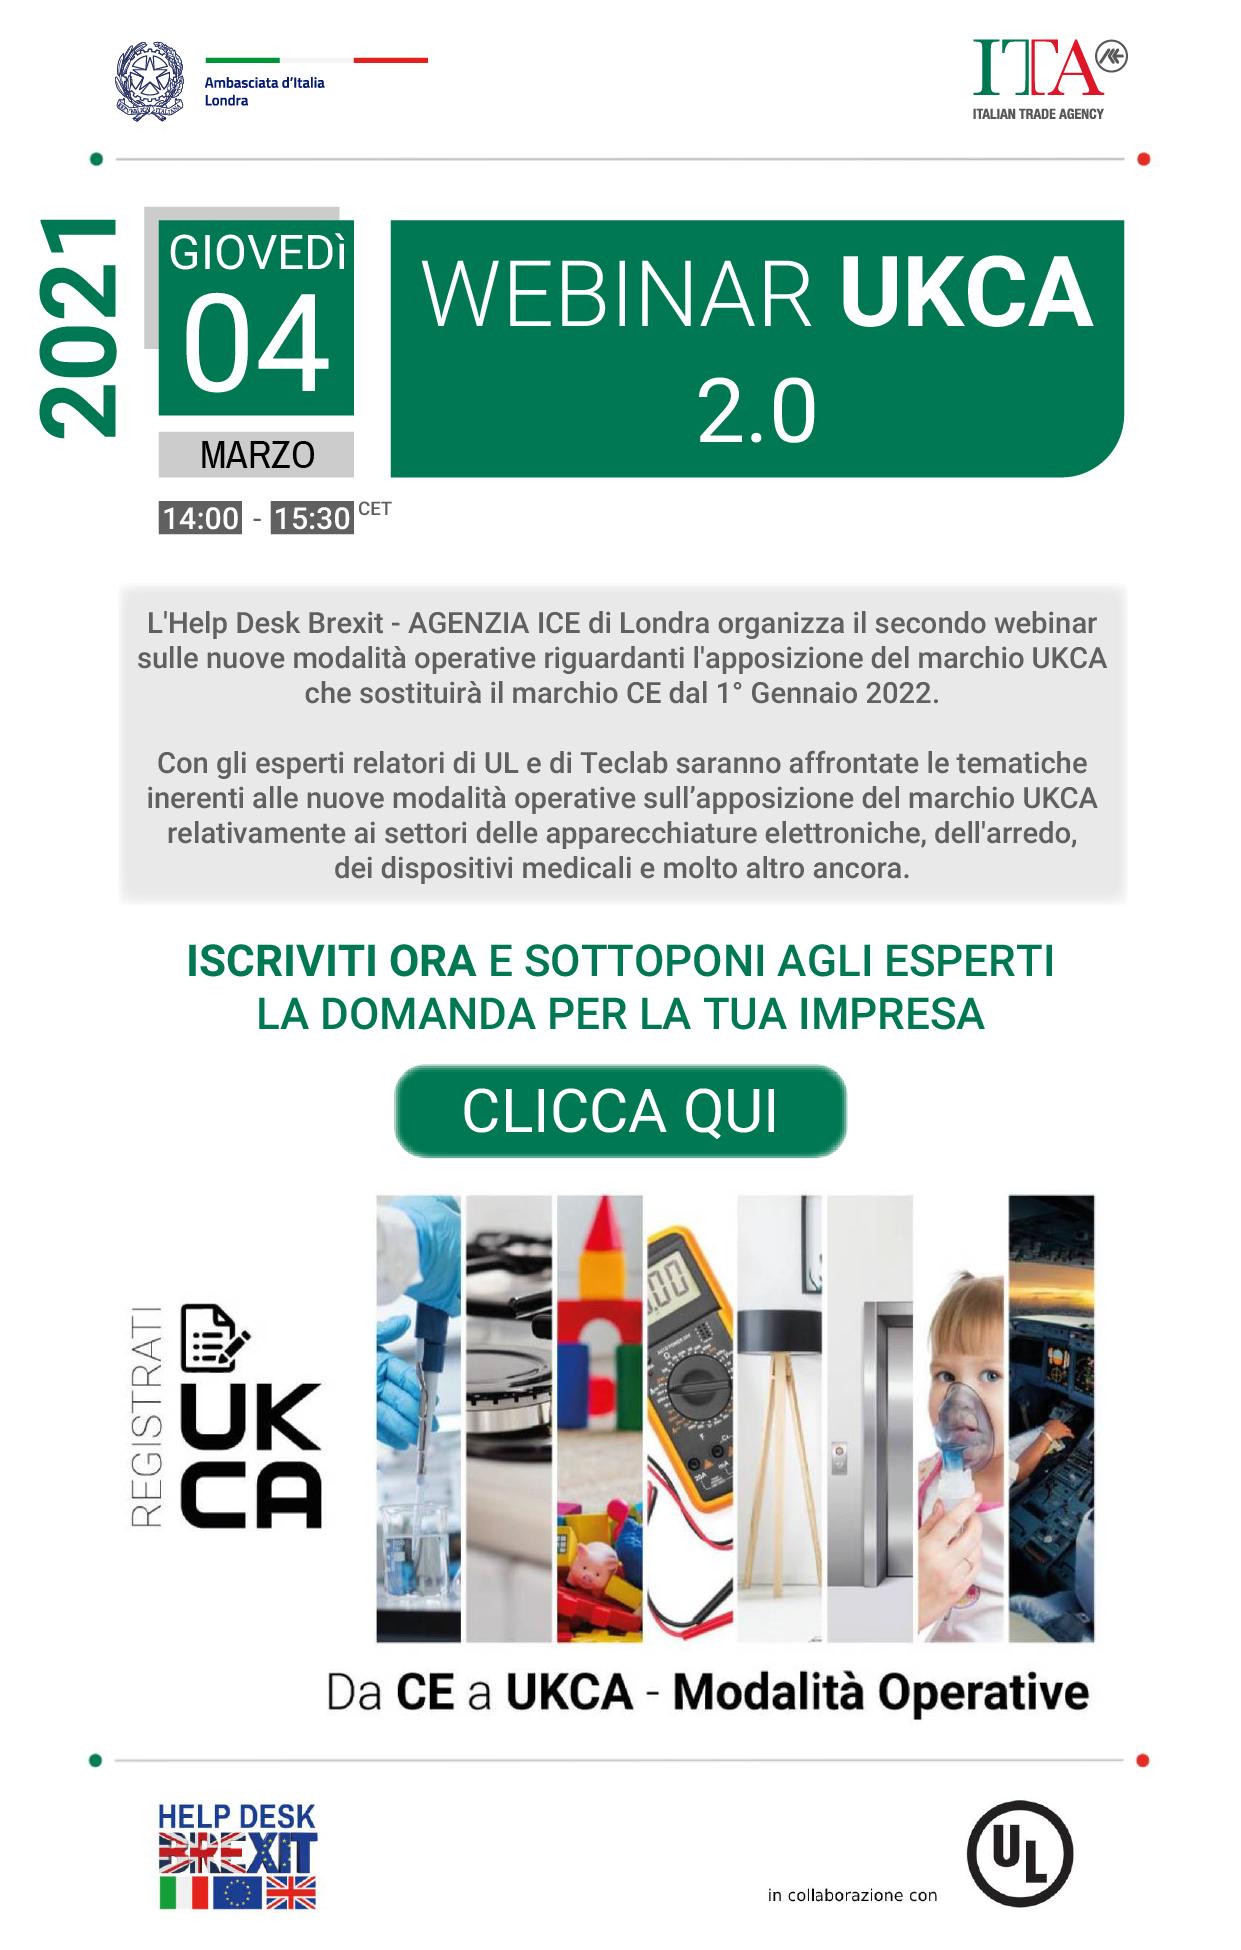 4 marzo 2021 Webinar UKCA 2.0